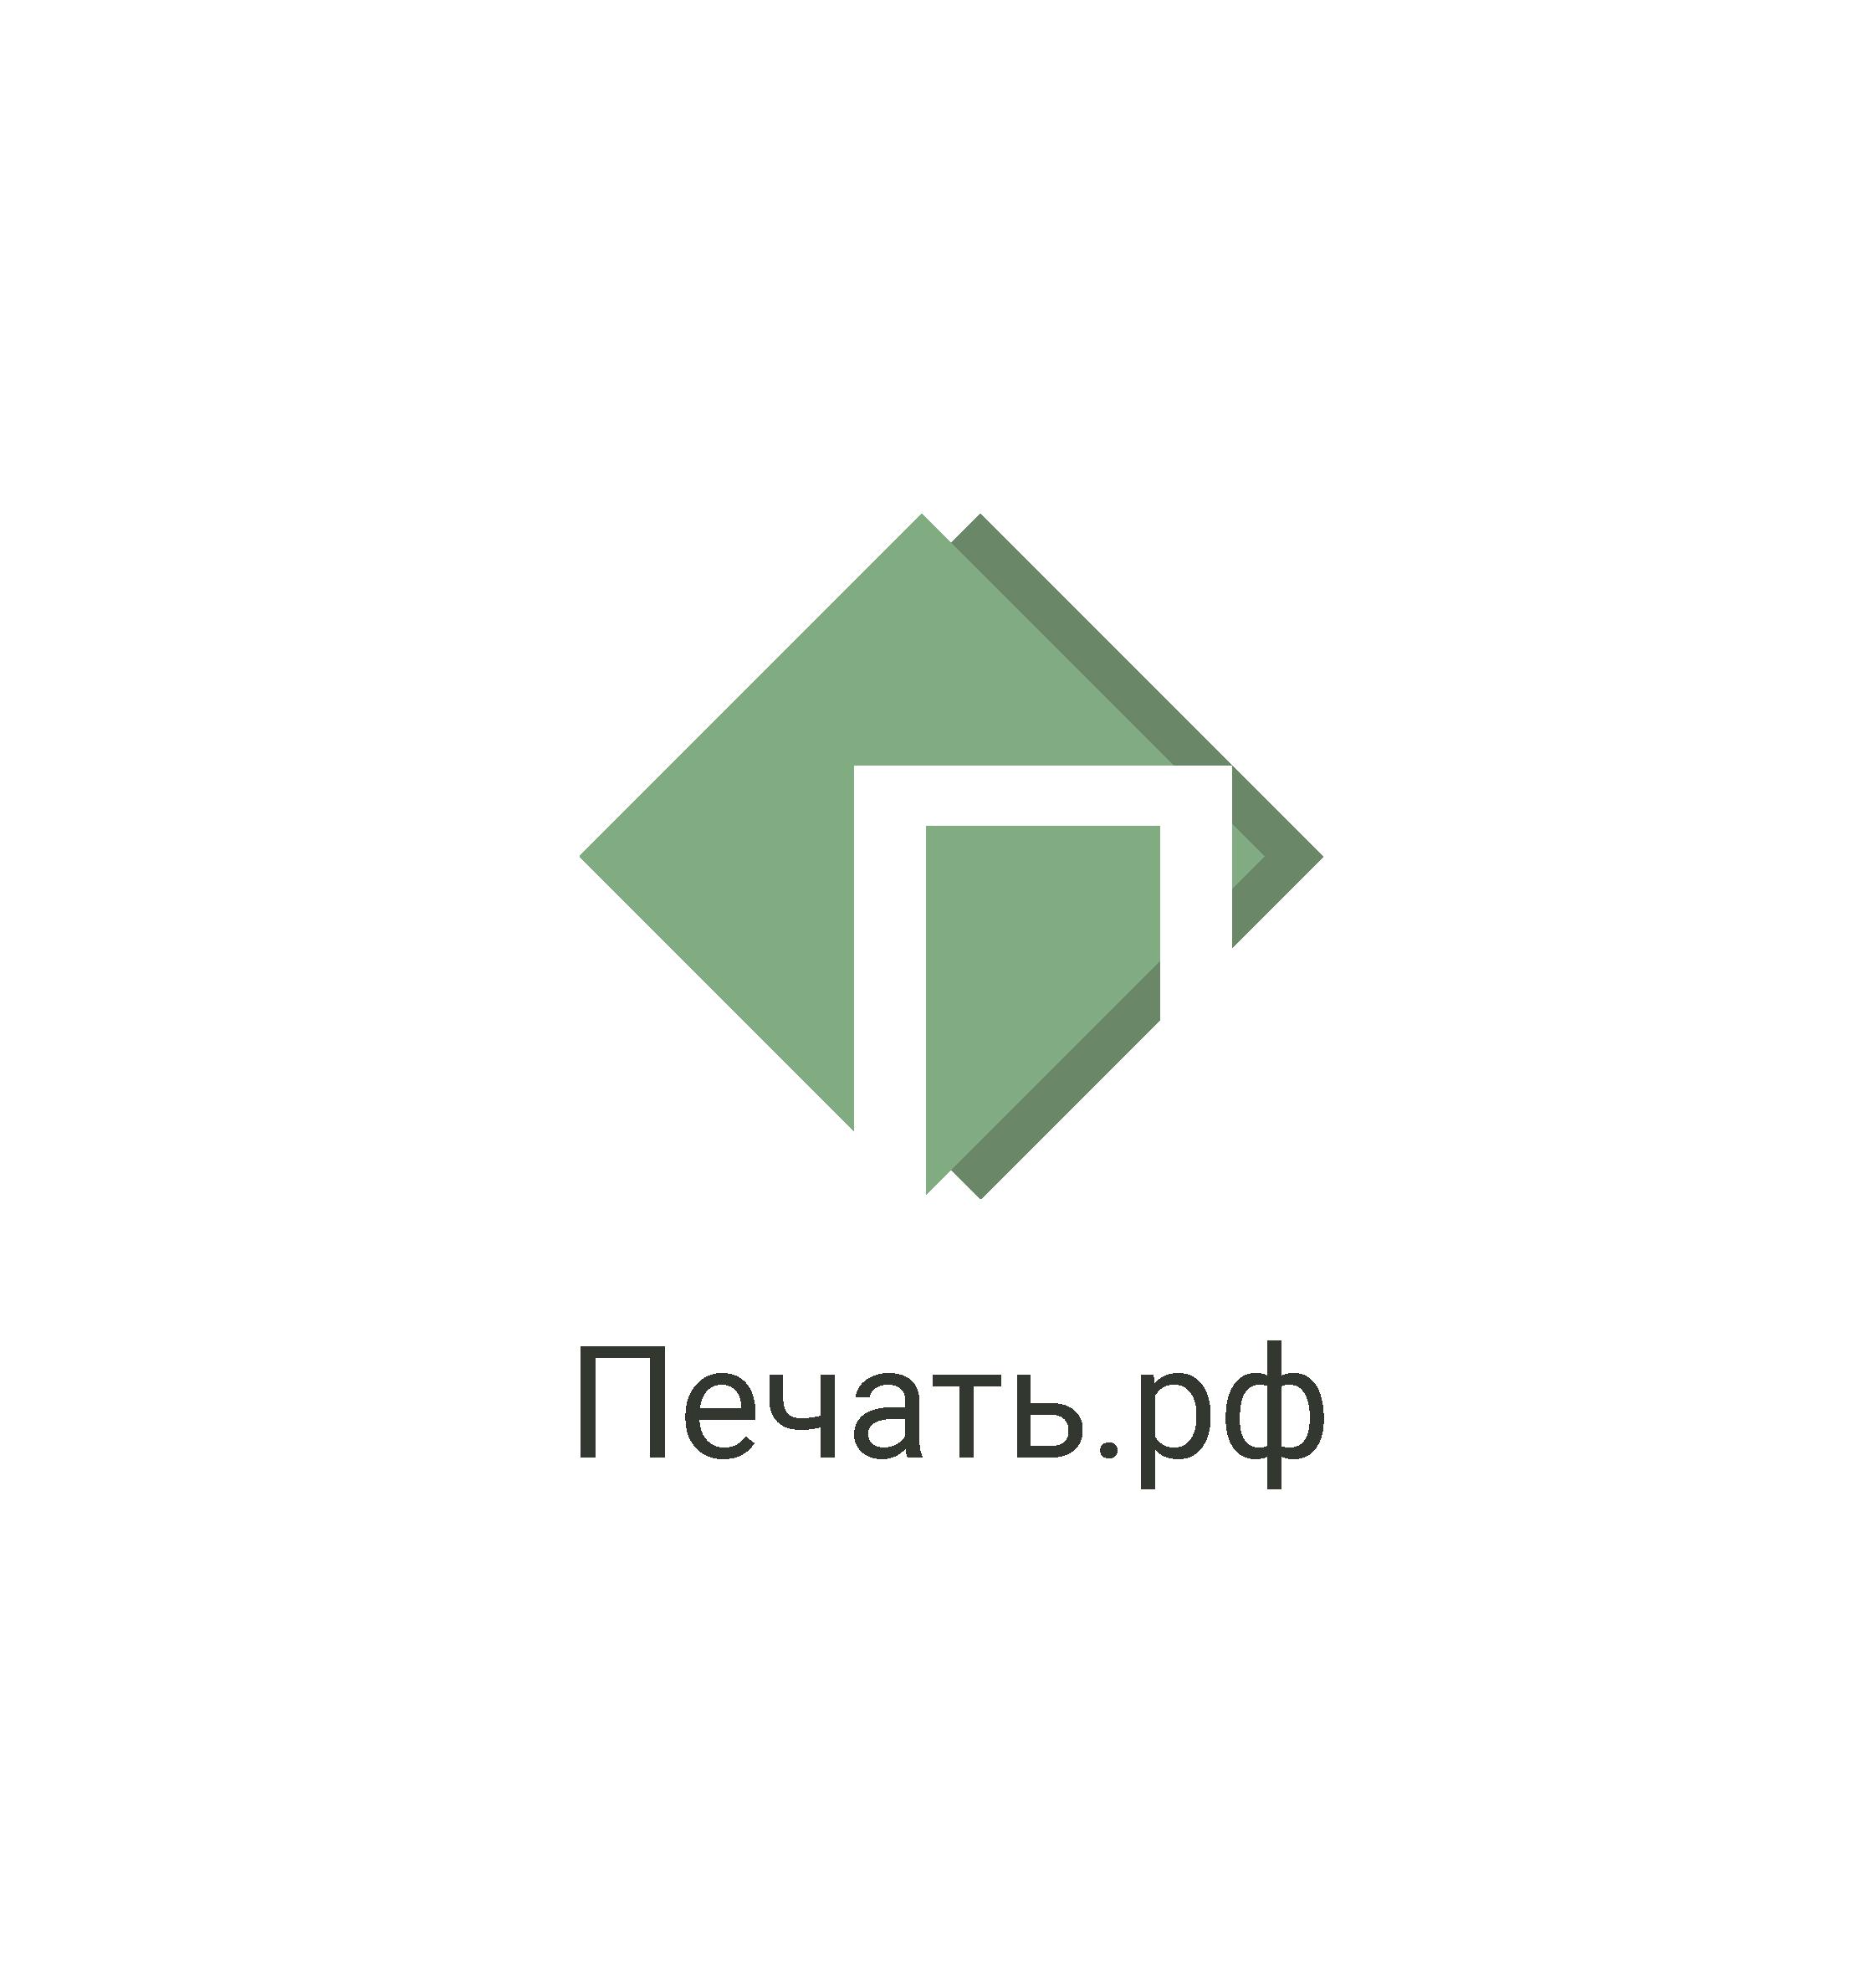 Логотип для веб-сервиса интерьерной печати и оперативной пол фото f_8625d28fe2f37f49.png